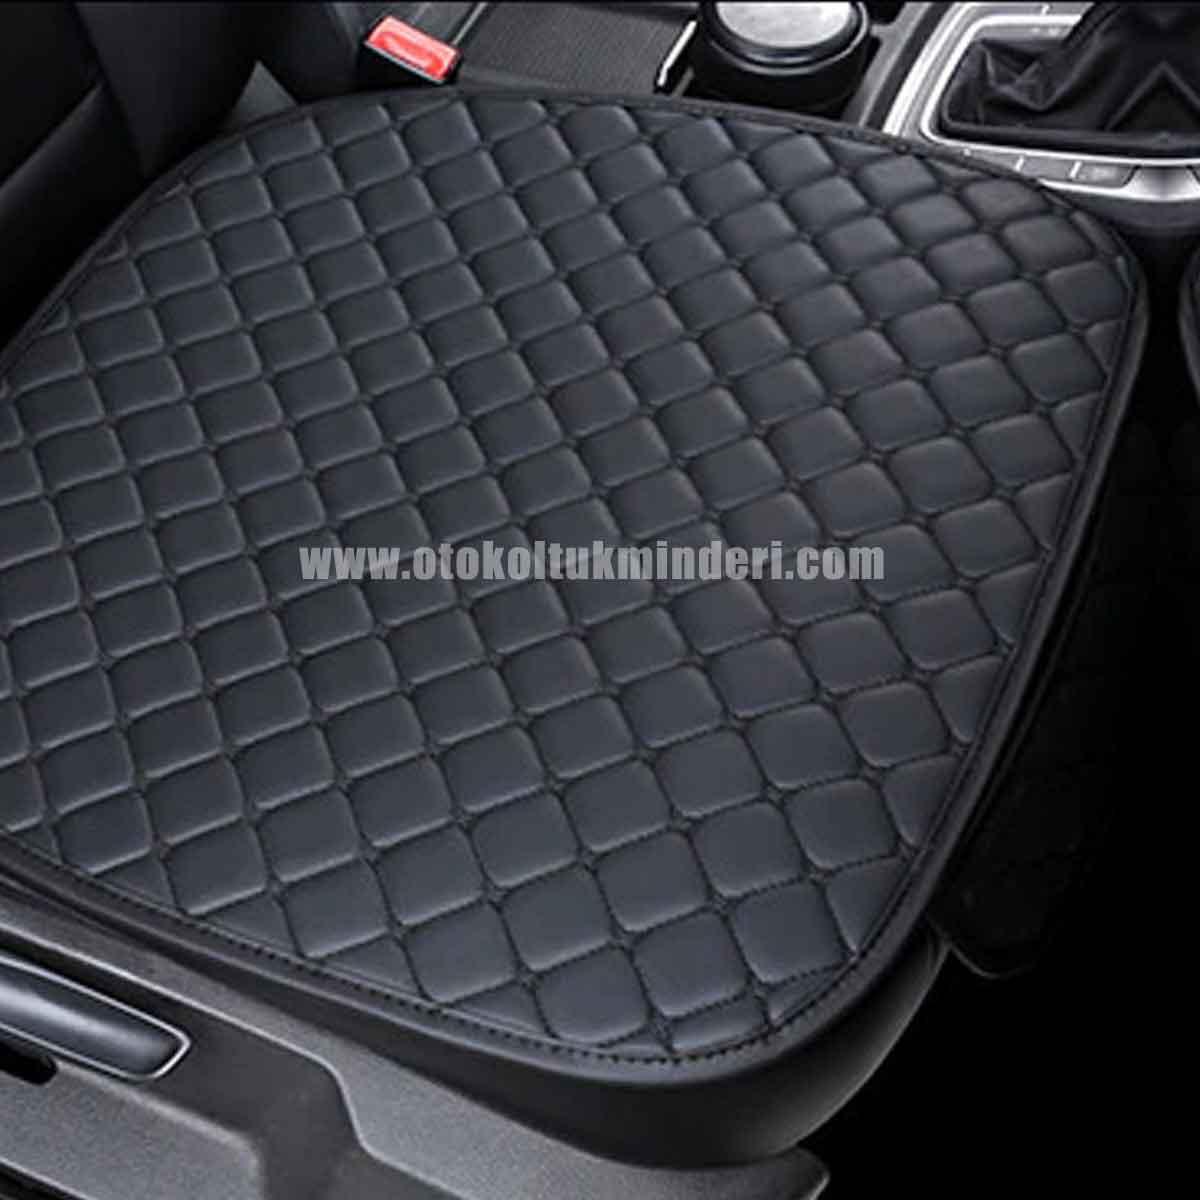 Jeep oto koltuk kılıfı